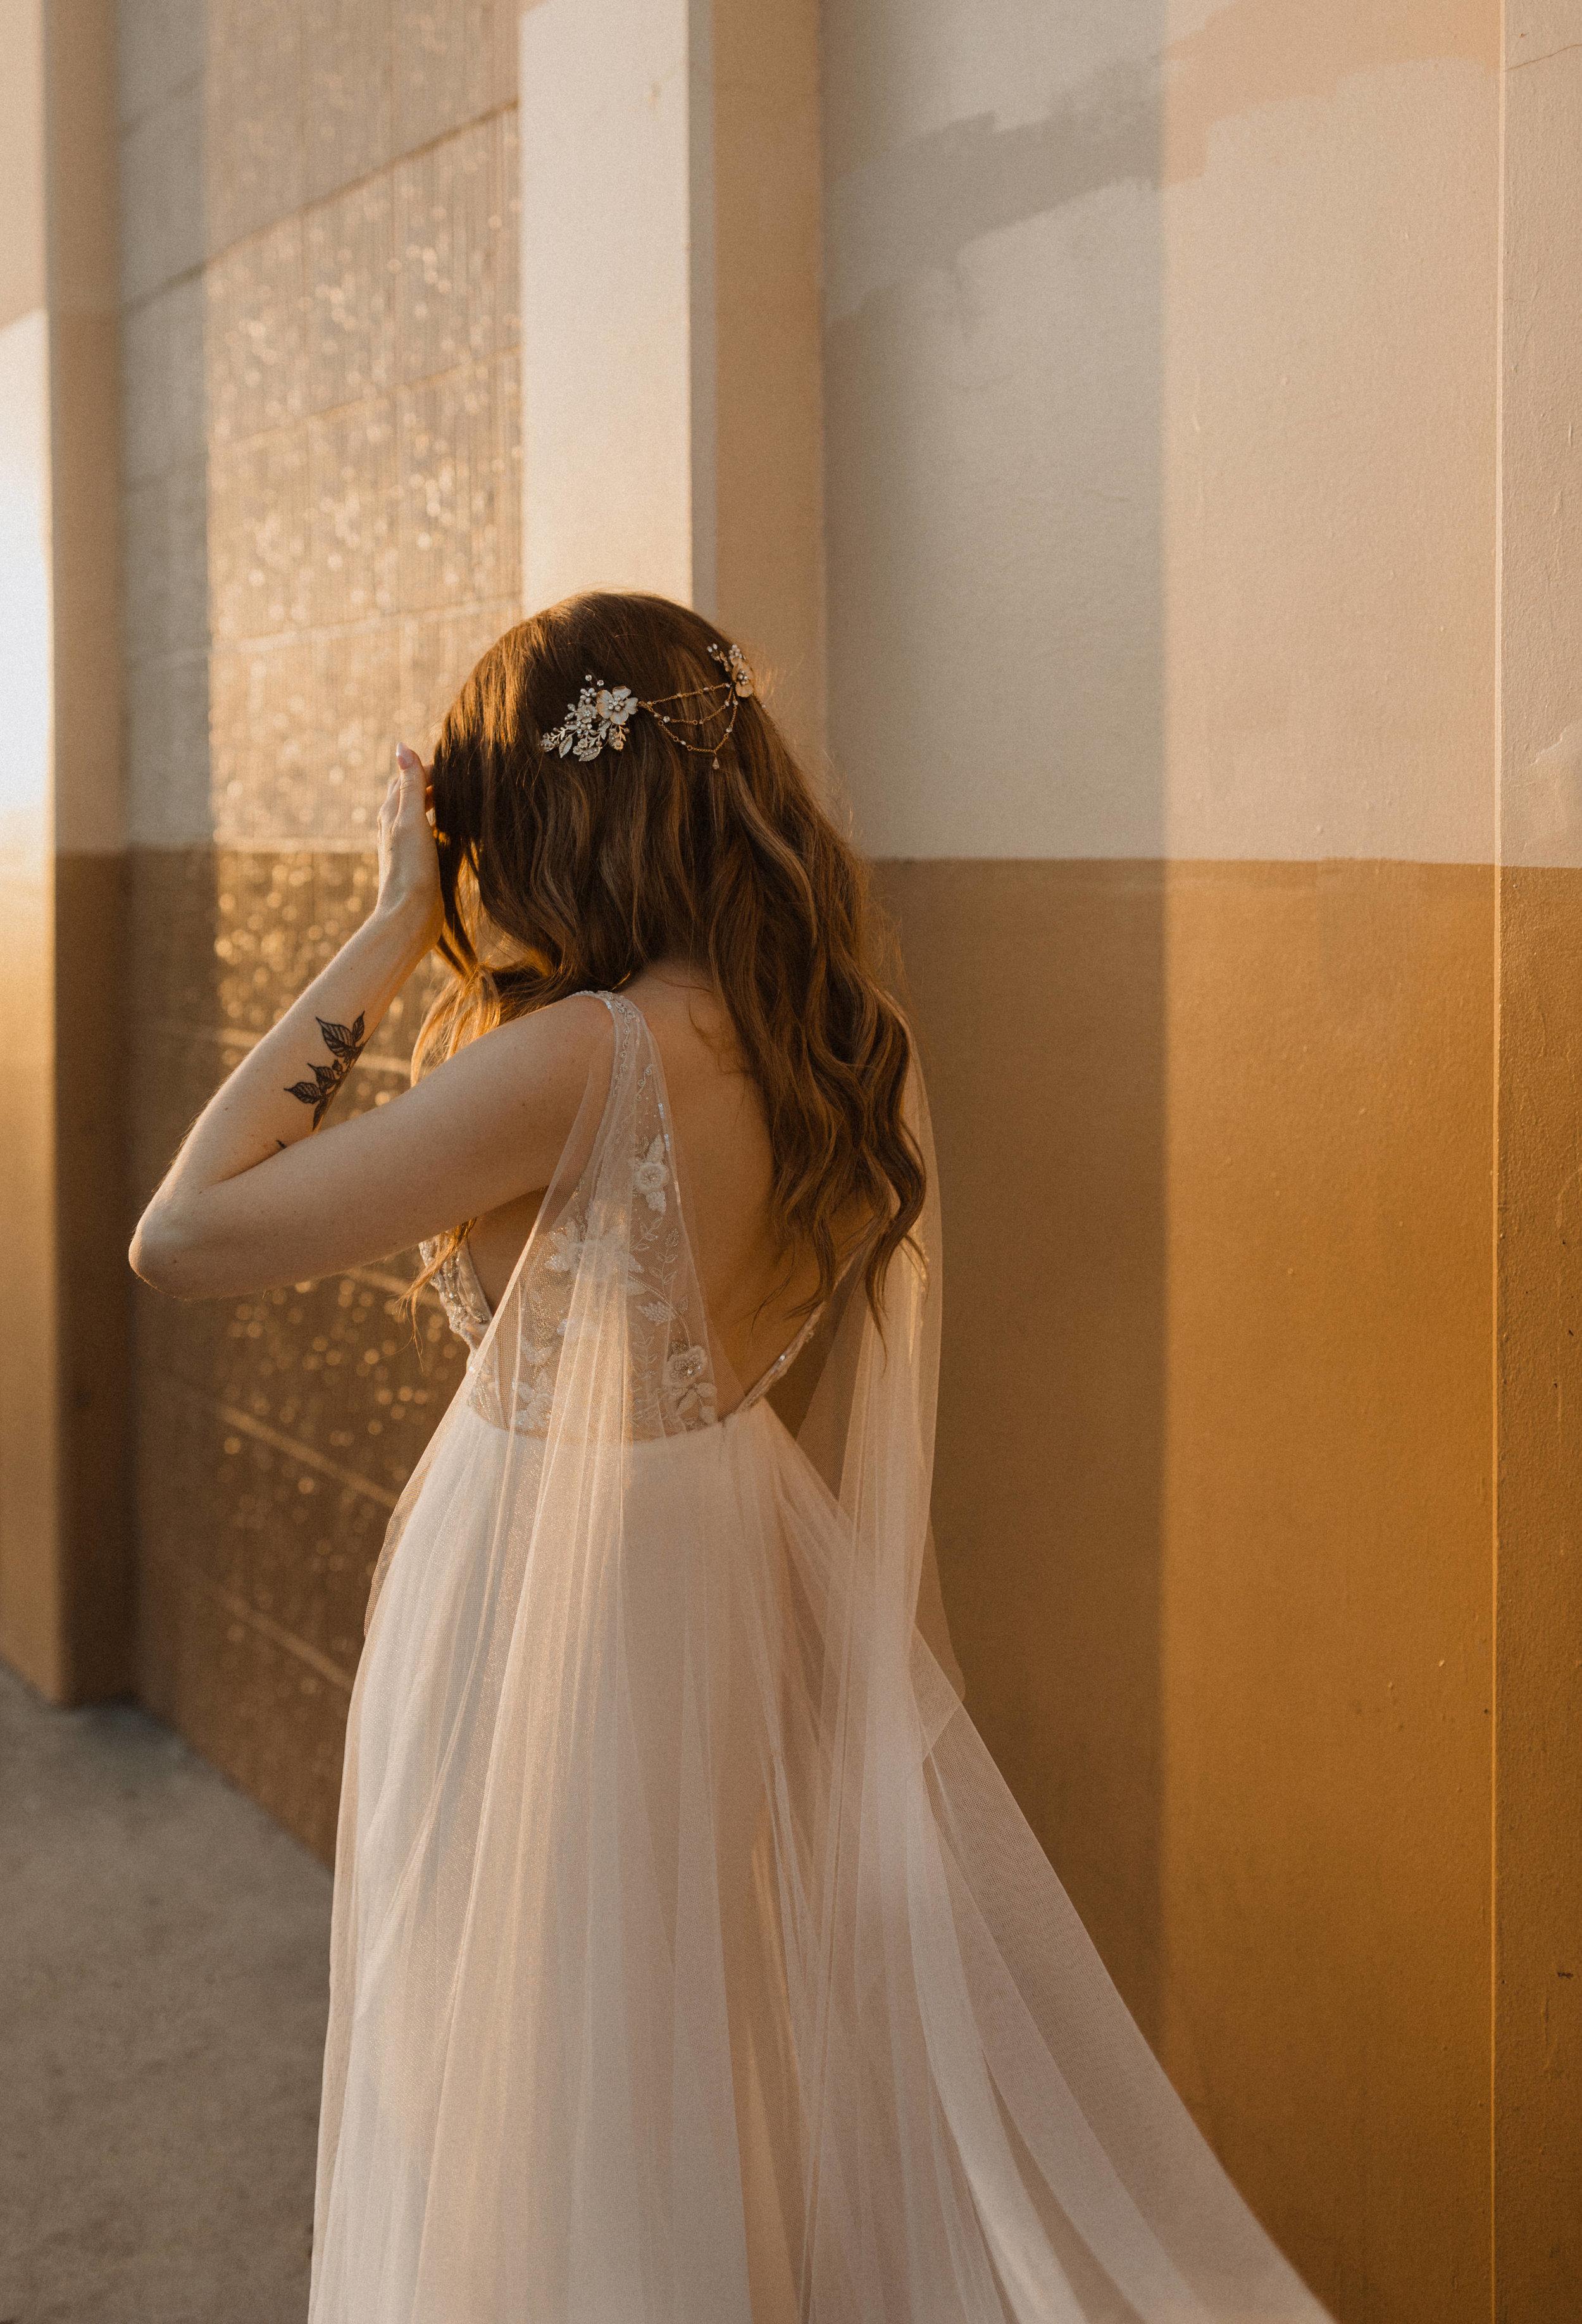 Downtown-LA-Wedding-MeganandRonny-461.jpg